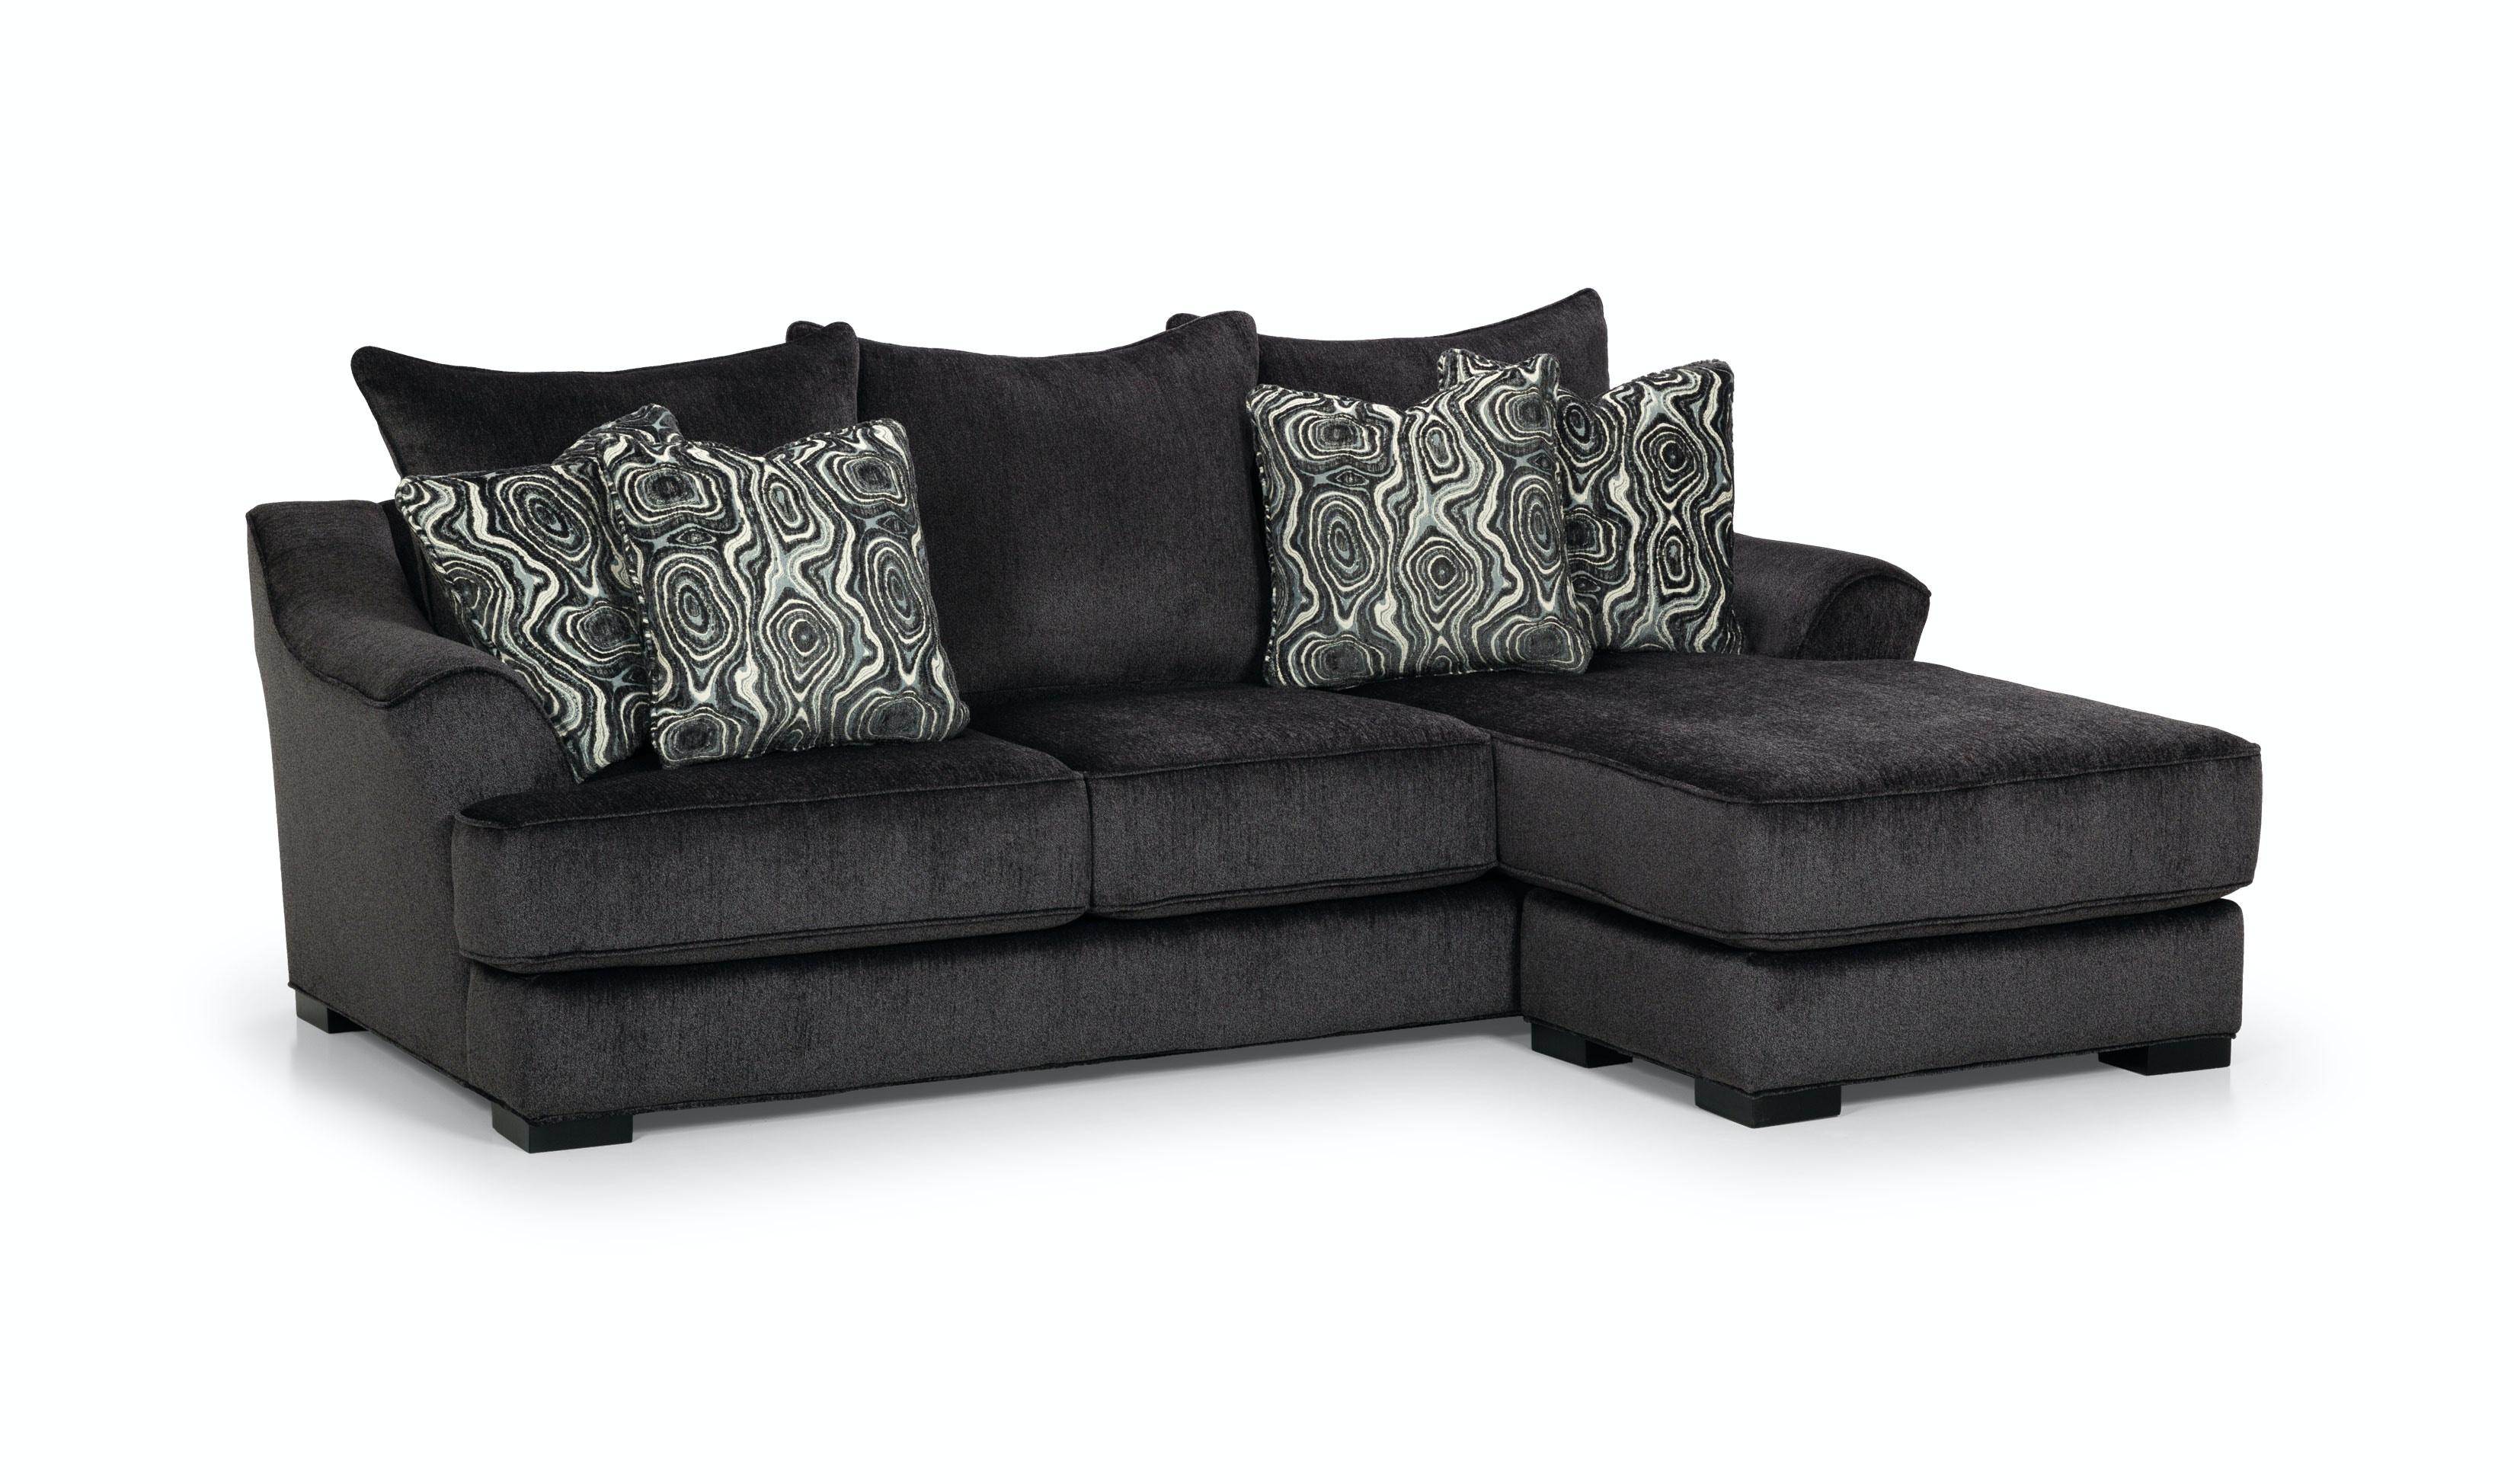 stanton sofa chaise 47433 portland or key home furnishings rh keyhomefurnishings com furniture portland oregon craigslist couches portland oregon